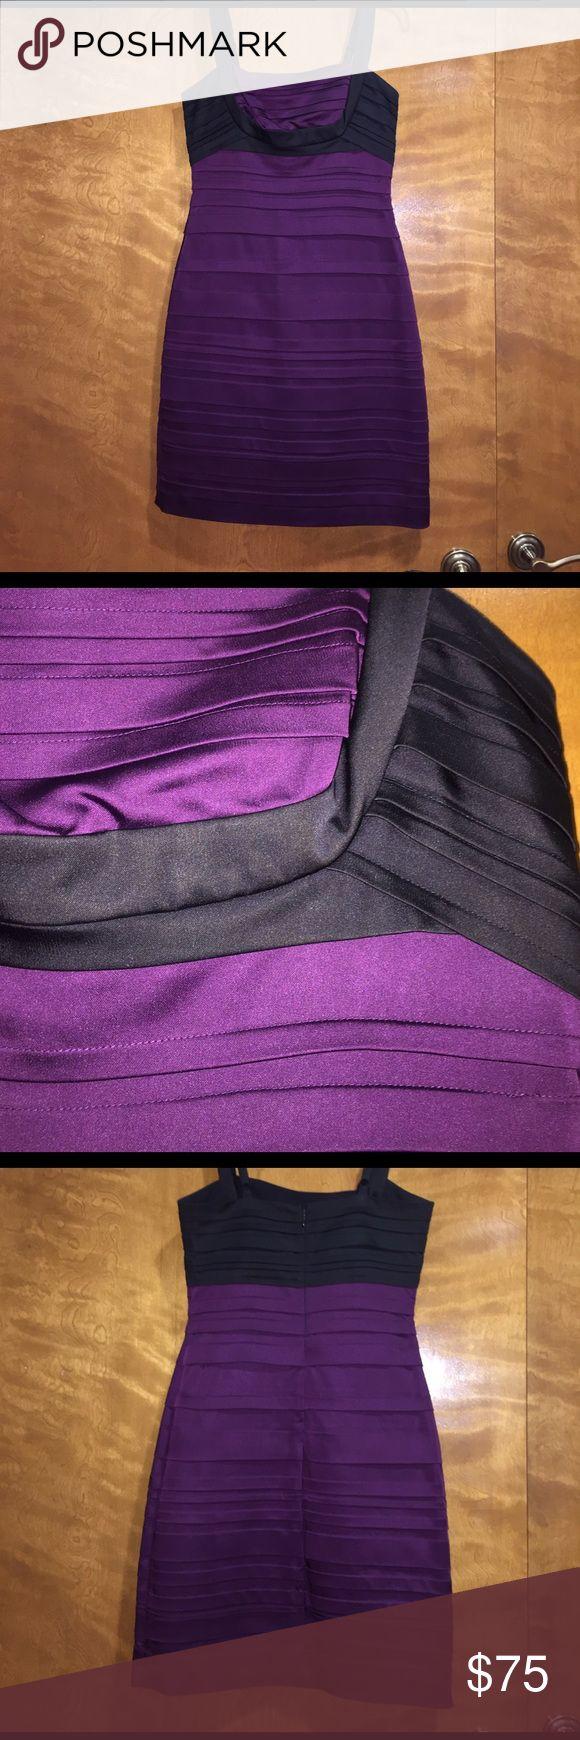 BCBG size 4 purple and black dres BCBG size 4 purple and black dress! Only worn once! BCBG Dresses